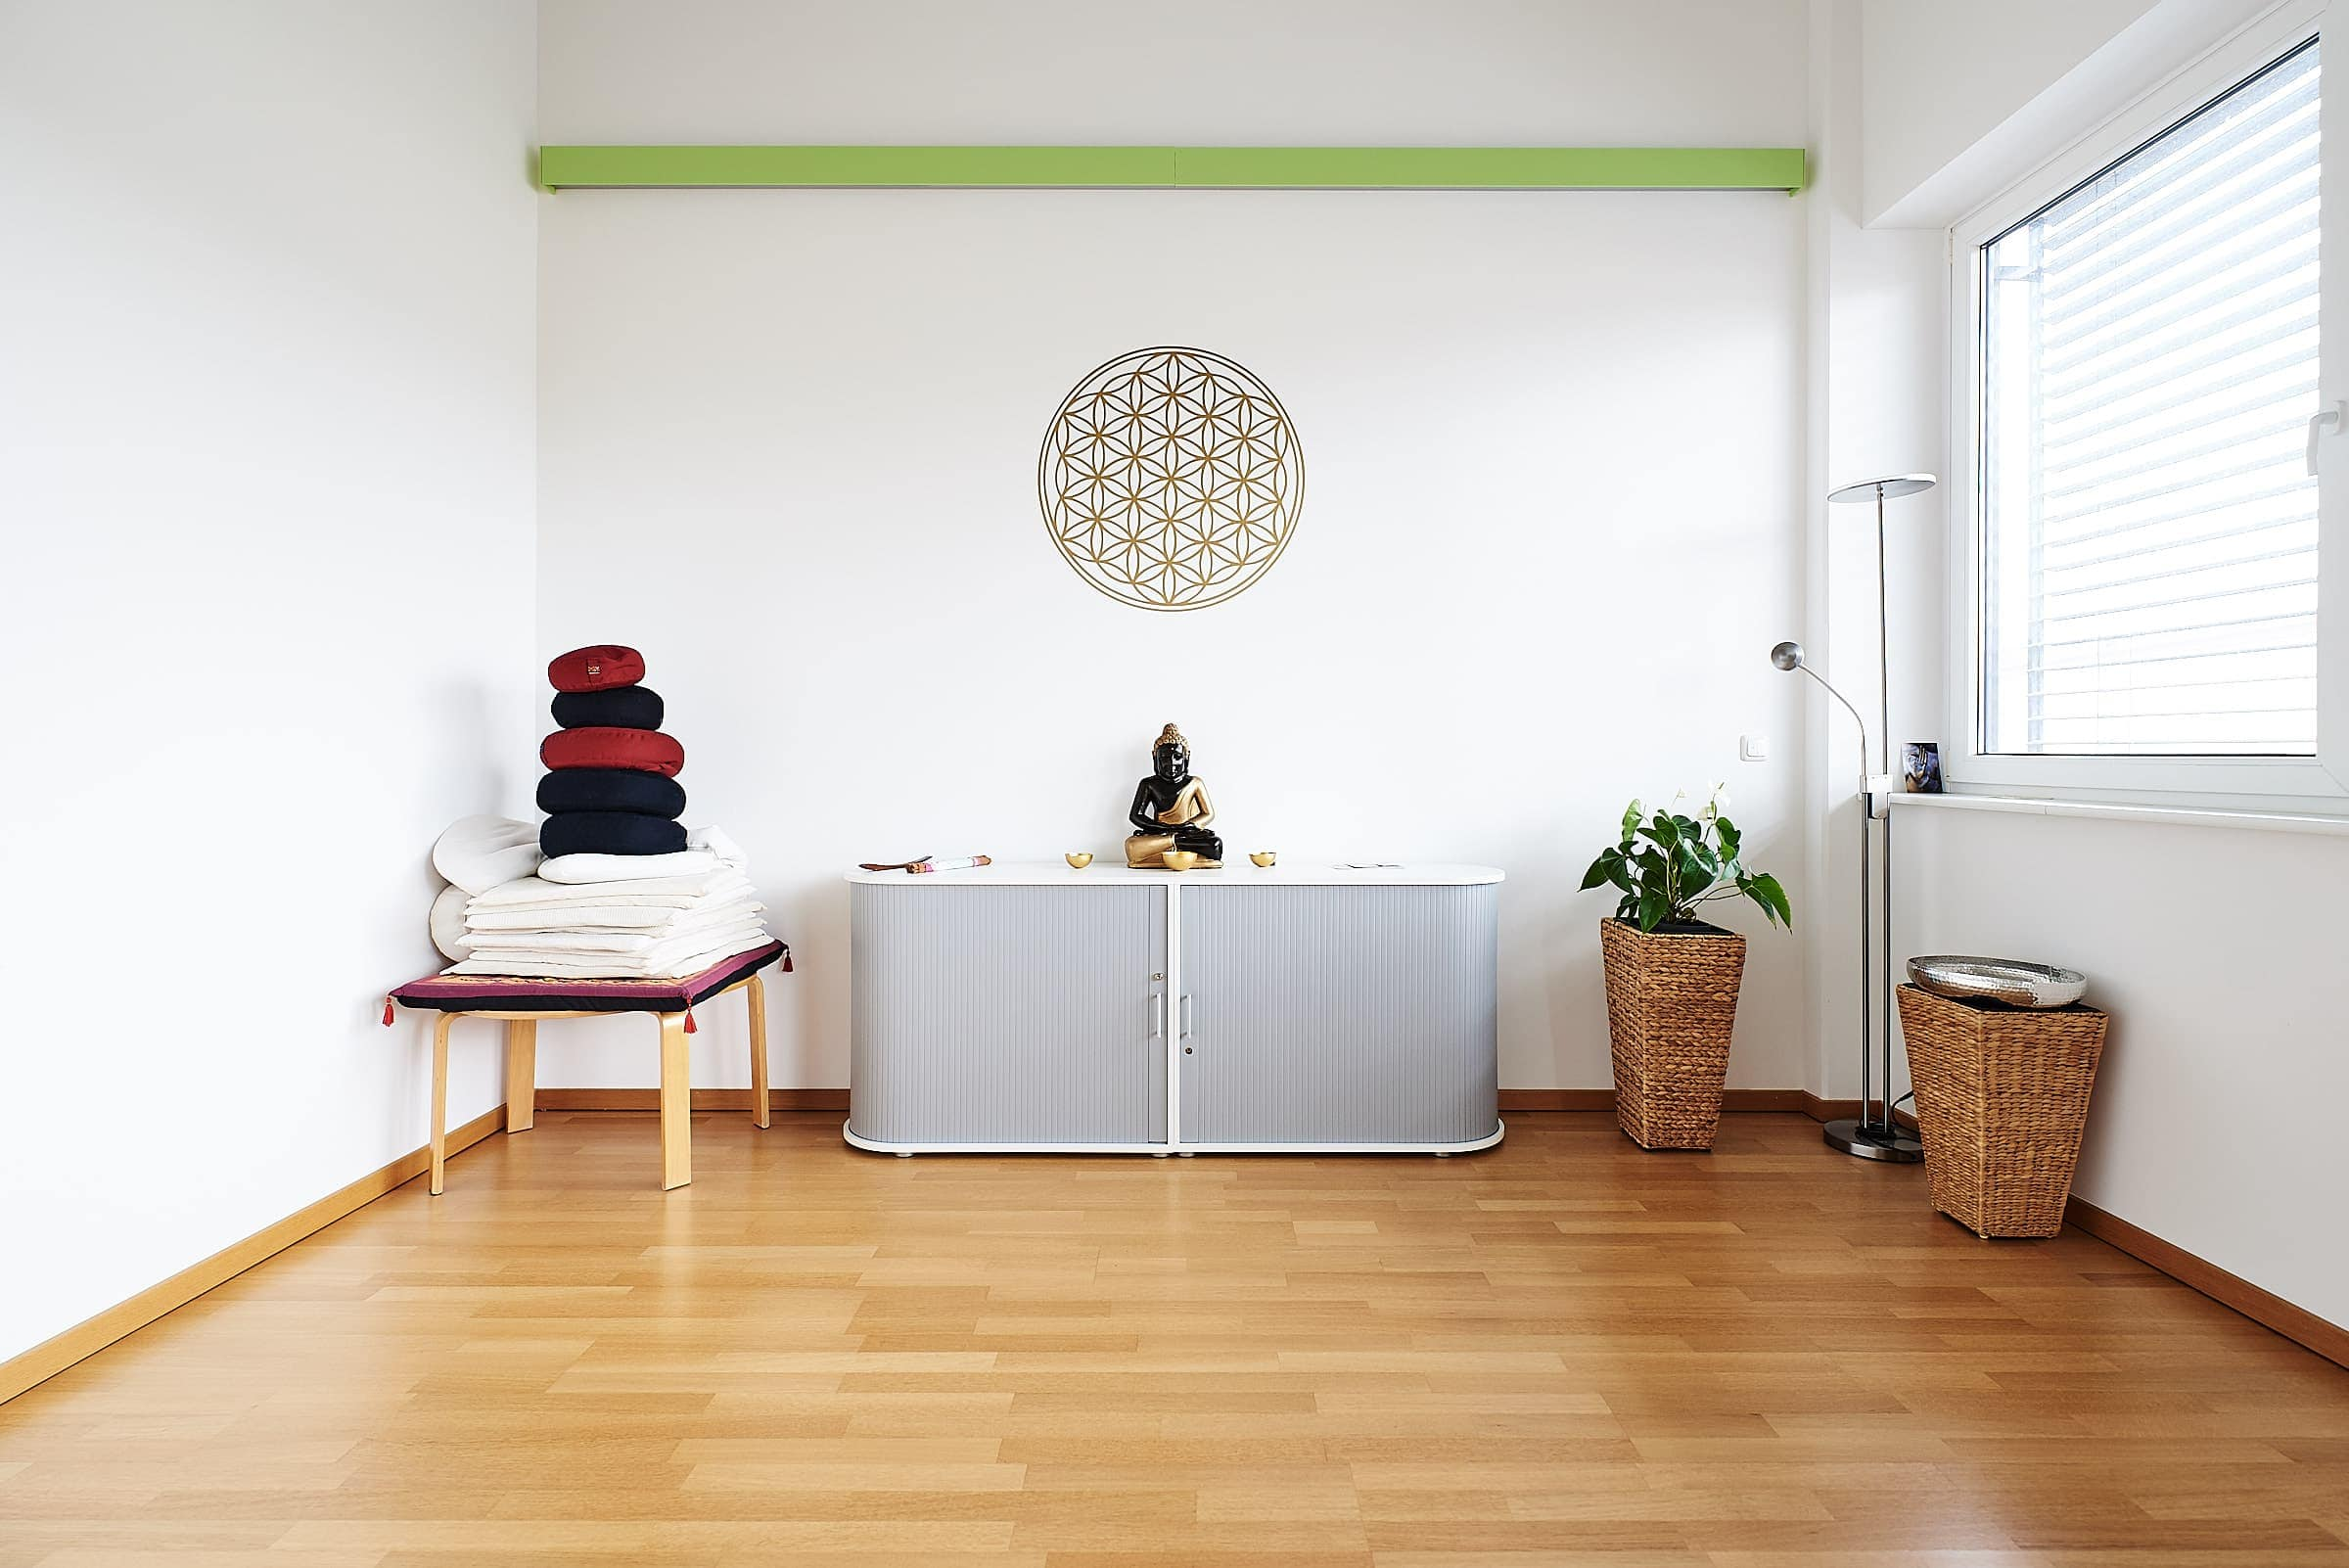 Firmenfotograf Trier Interieur Yogaschule Meditationsraum